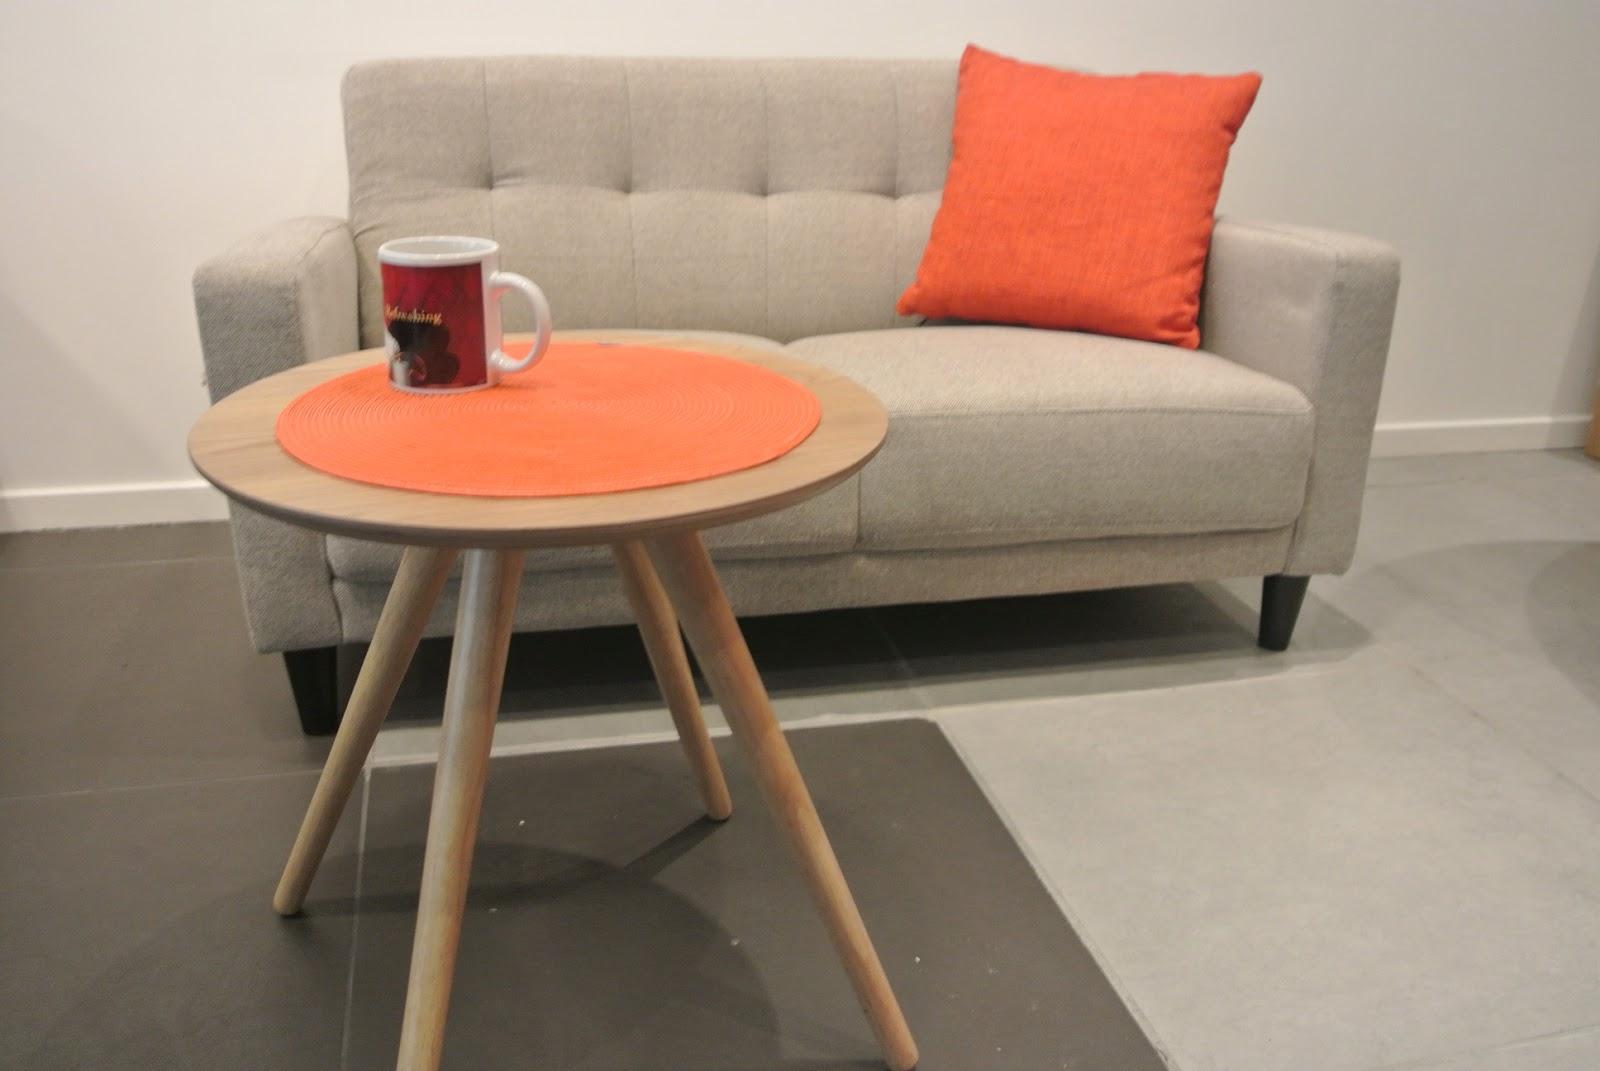 si edward hopper avait connu les meubles design mycreationdesign. Black Bedroom Furniture Sets. Home Design Ideas